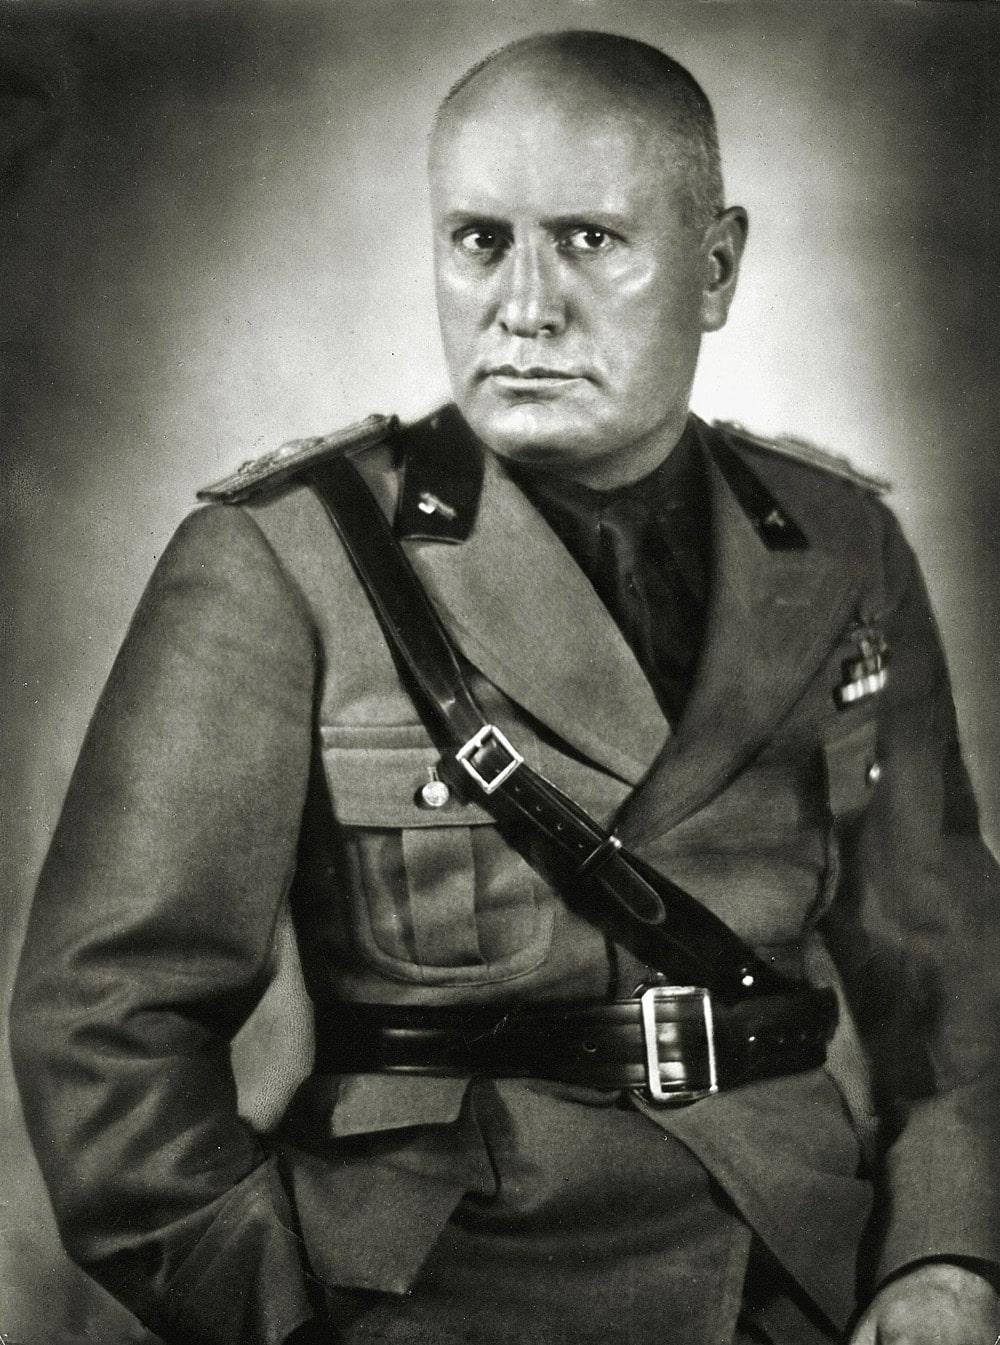 Benito-Mussolini-interesnyefakty.org-1